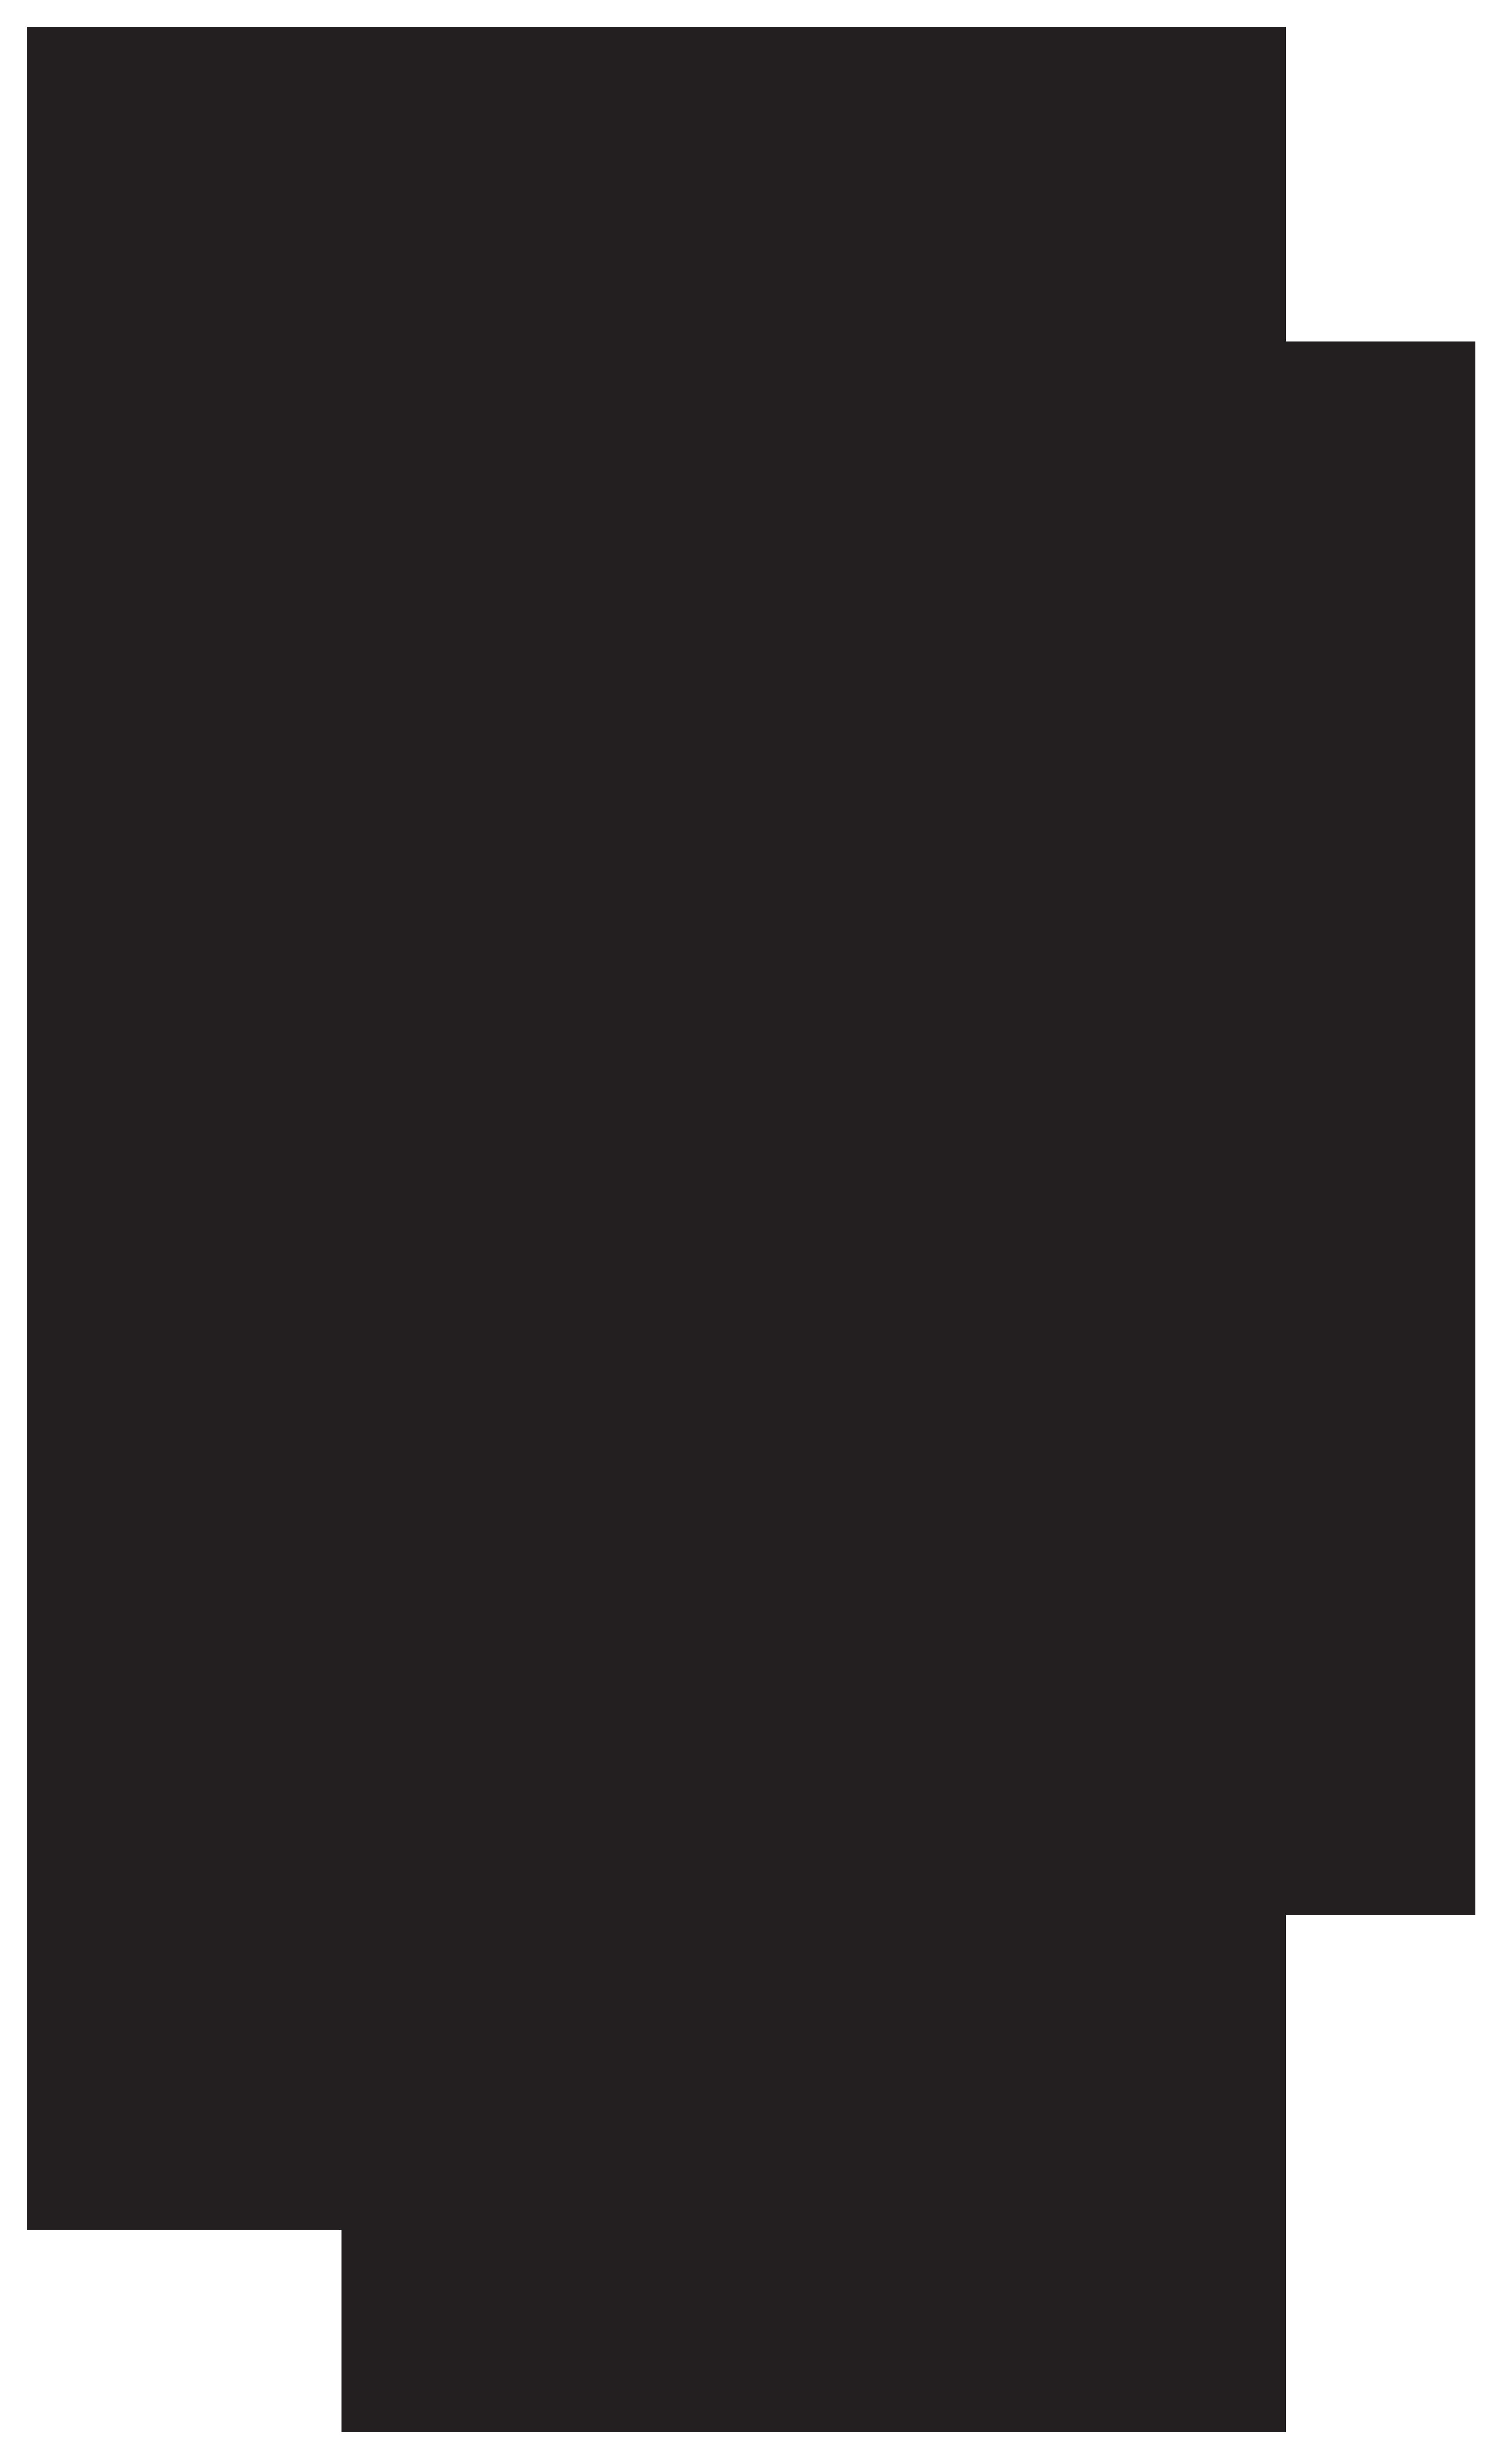 Fingerprint clipart. Png clip art image